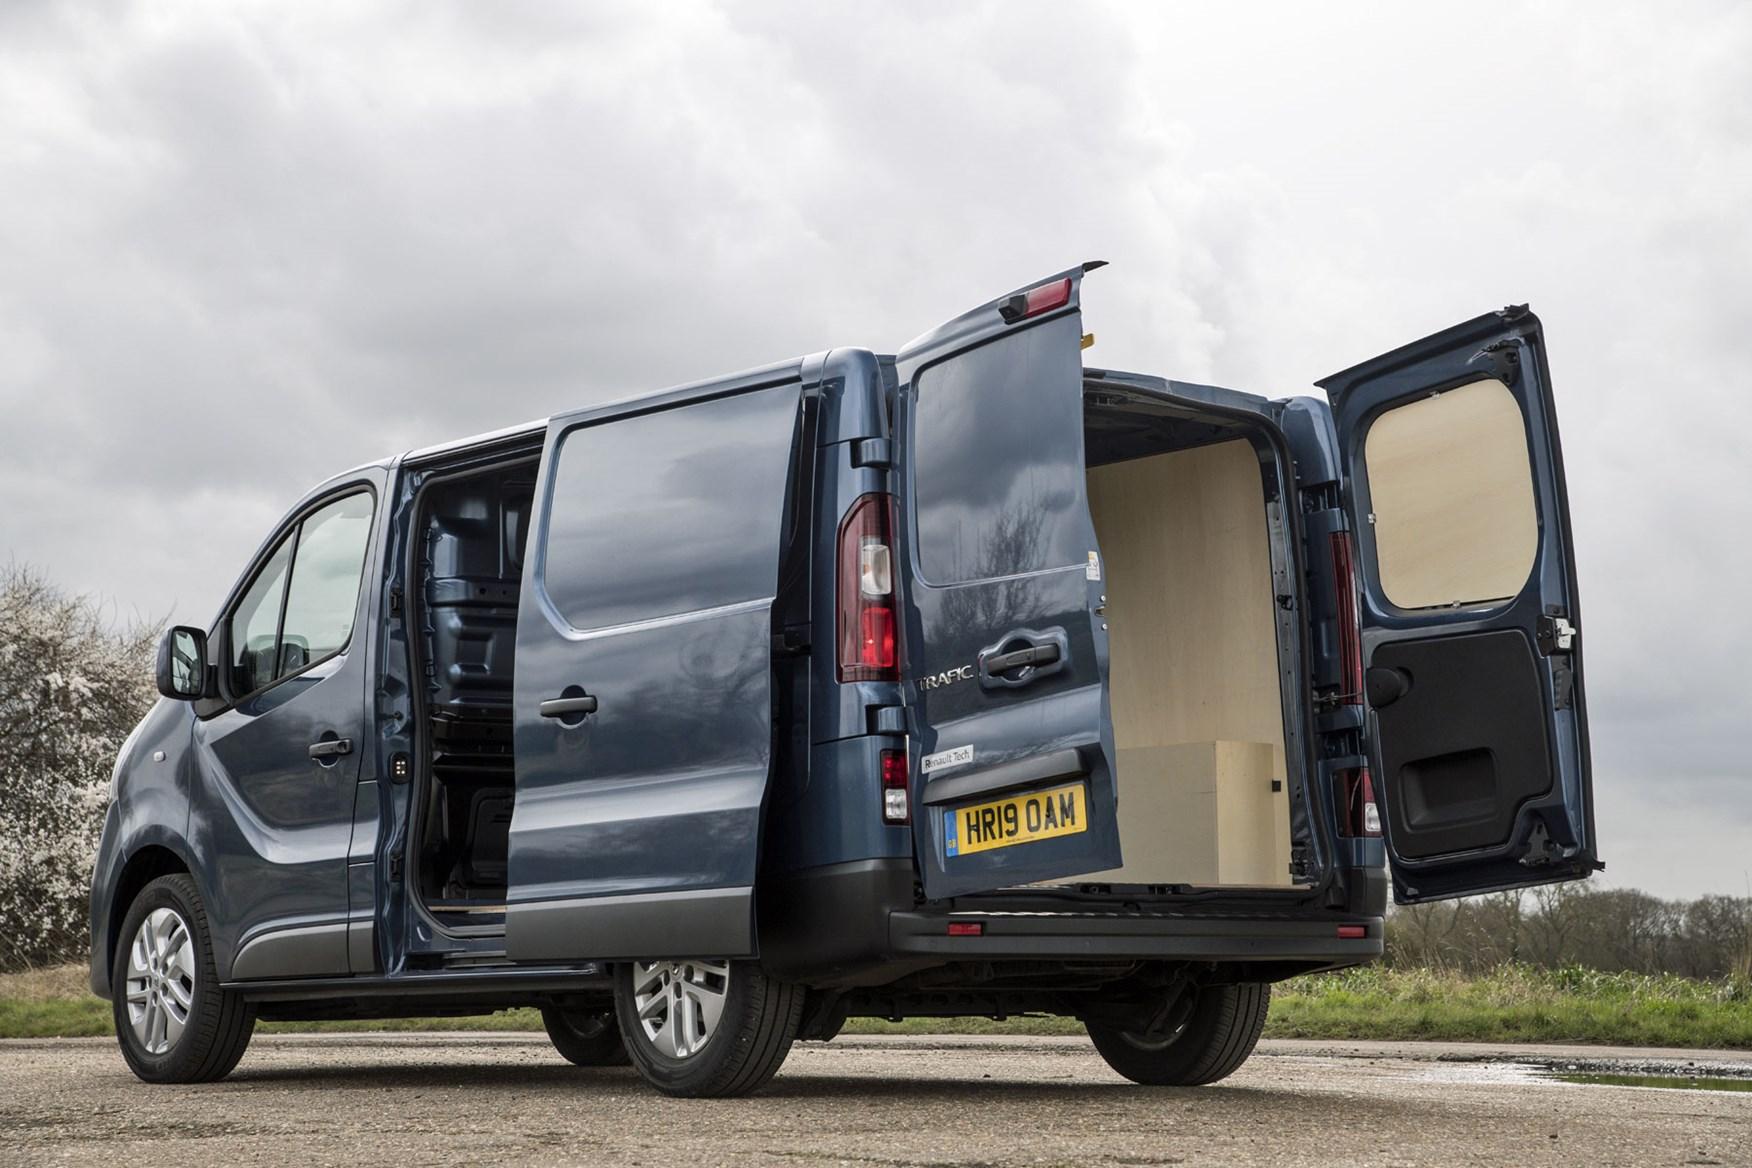 Attractive Design Heavy Duty Durable Waterproof S- tech automotive TRAFIC 9 Seater Minibus Black Van Seat Covers 2+1